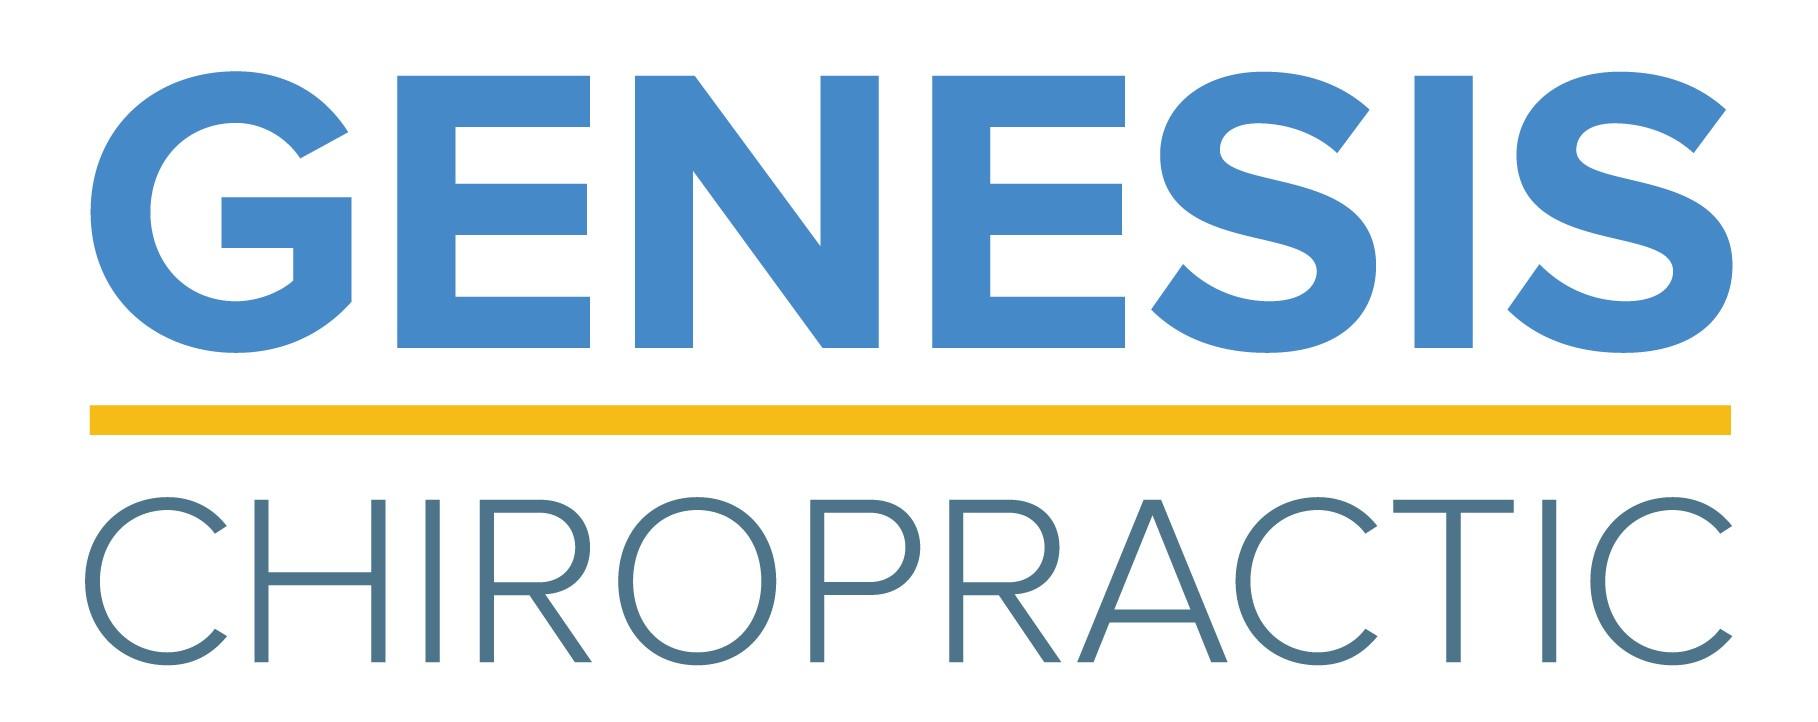 Genesis Chiropractic Clinic | LinkedIn